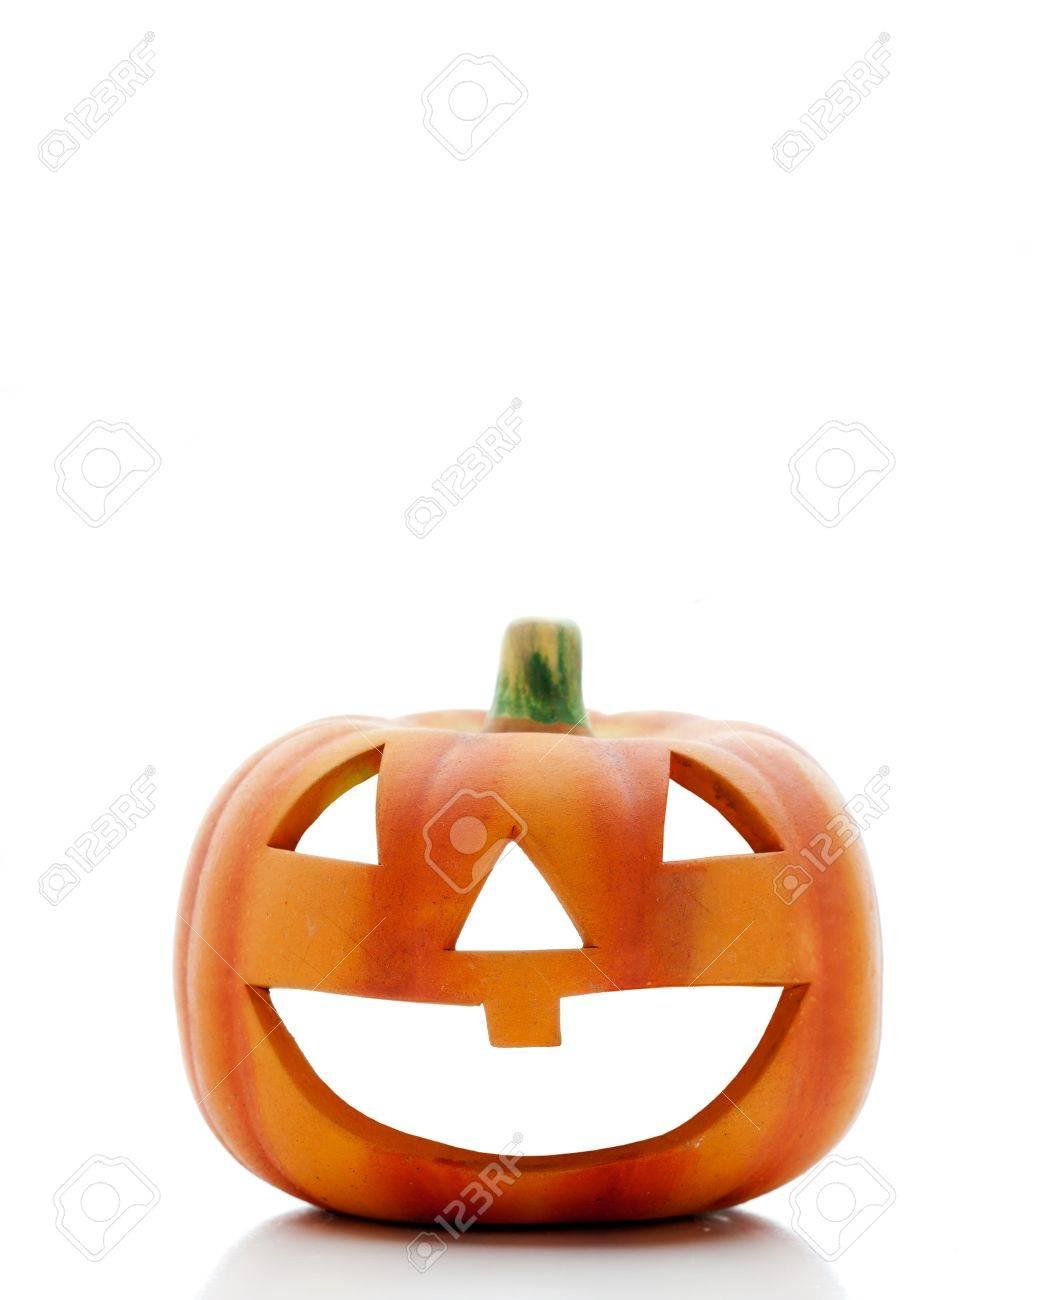 Orange halloween pumpkin isolated on white background Stock Photo - 14960857